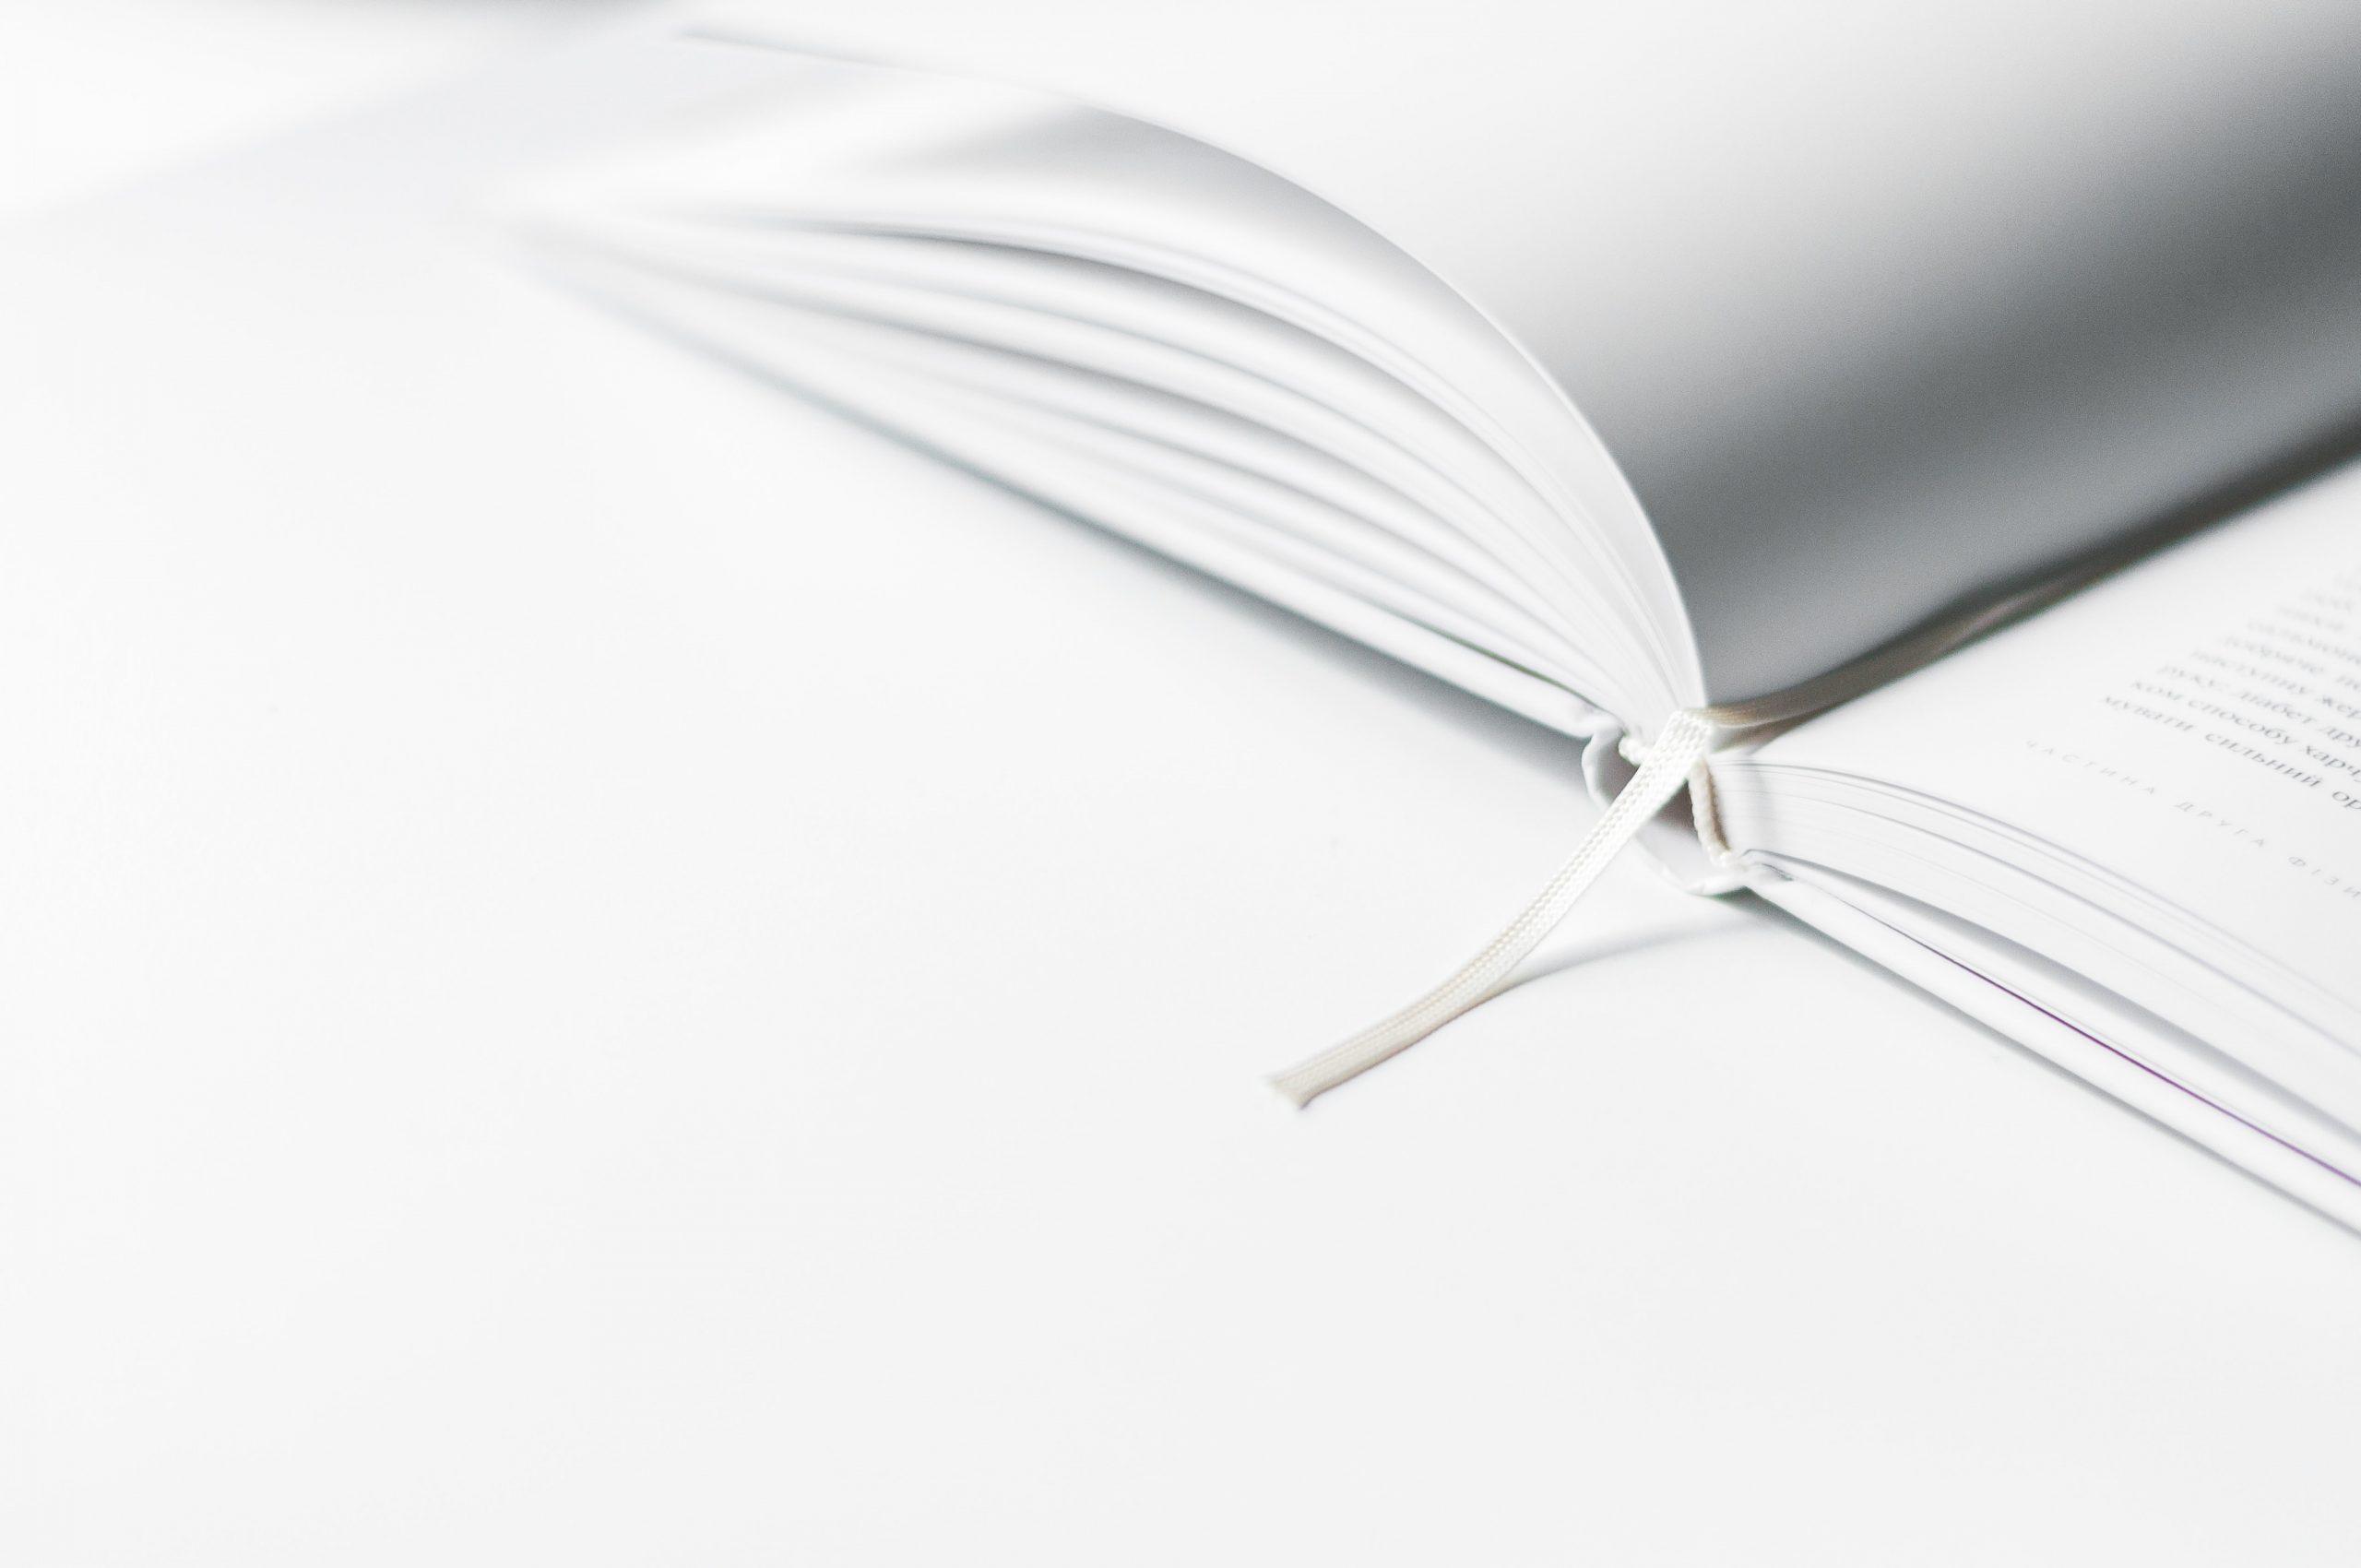 image-book